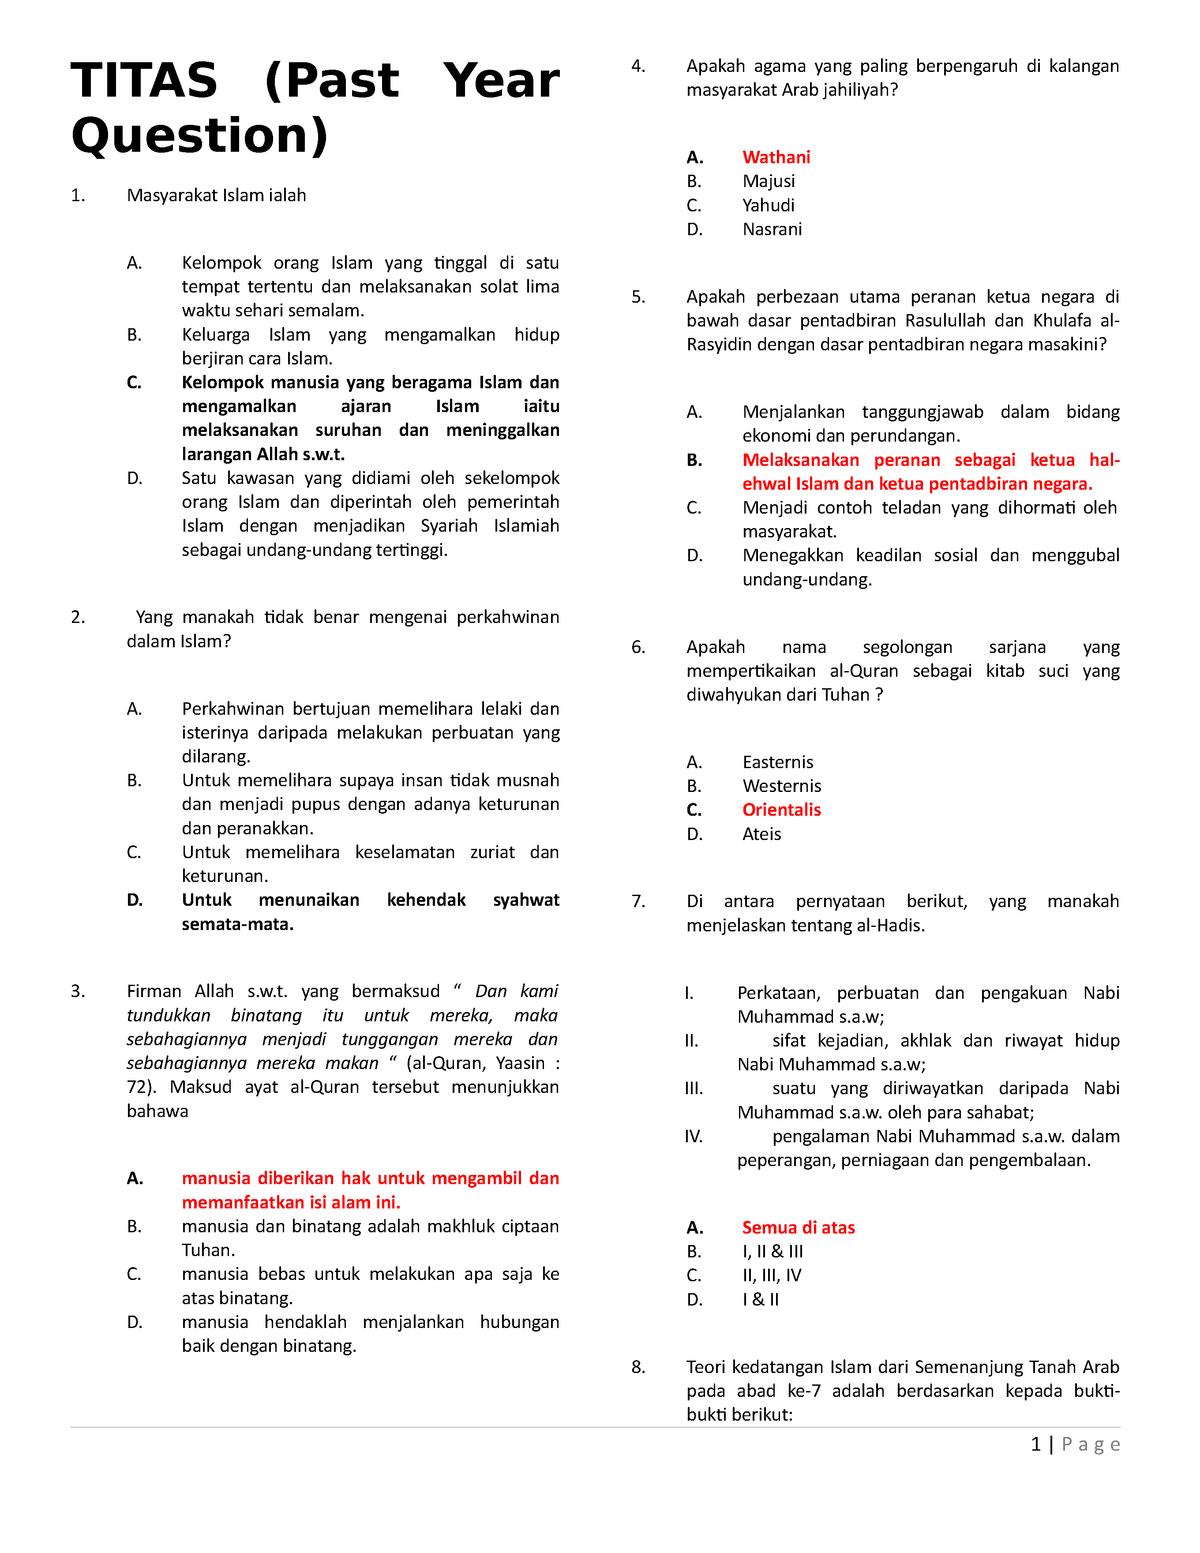 Exam 10 January 2011 Questions Titas Mpu 3213 Ou Studocu